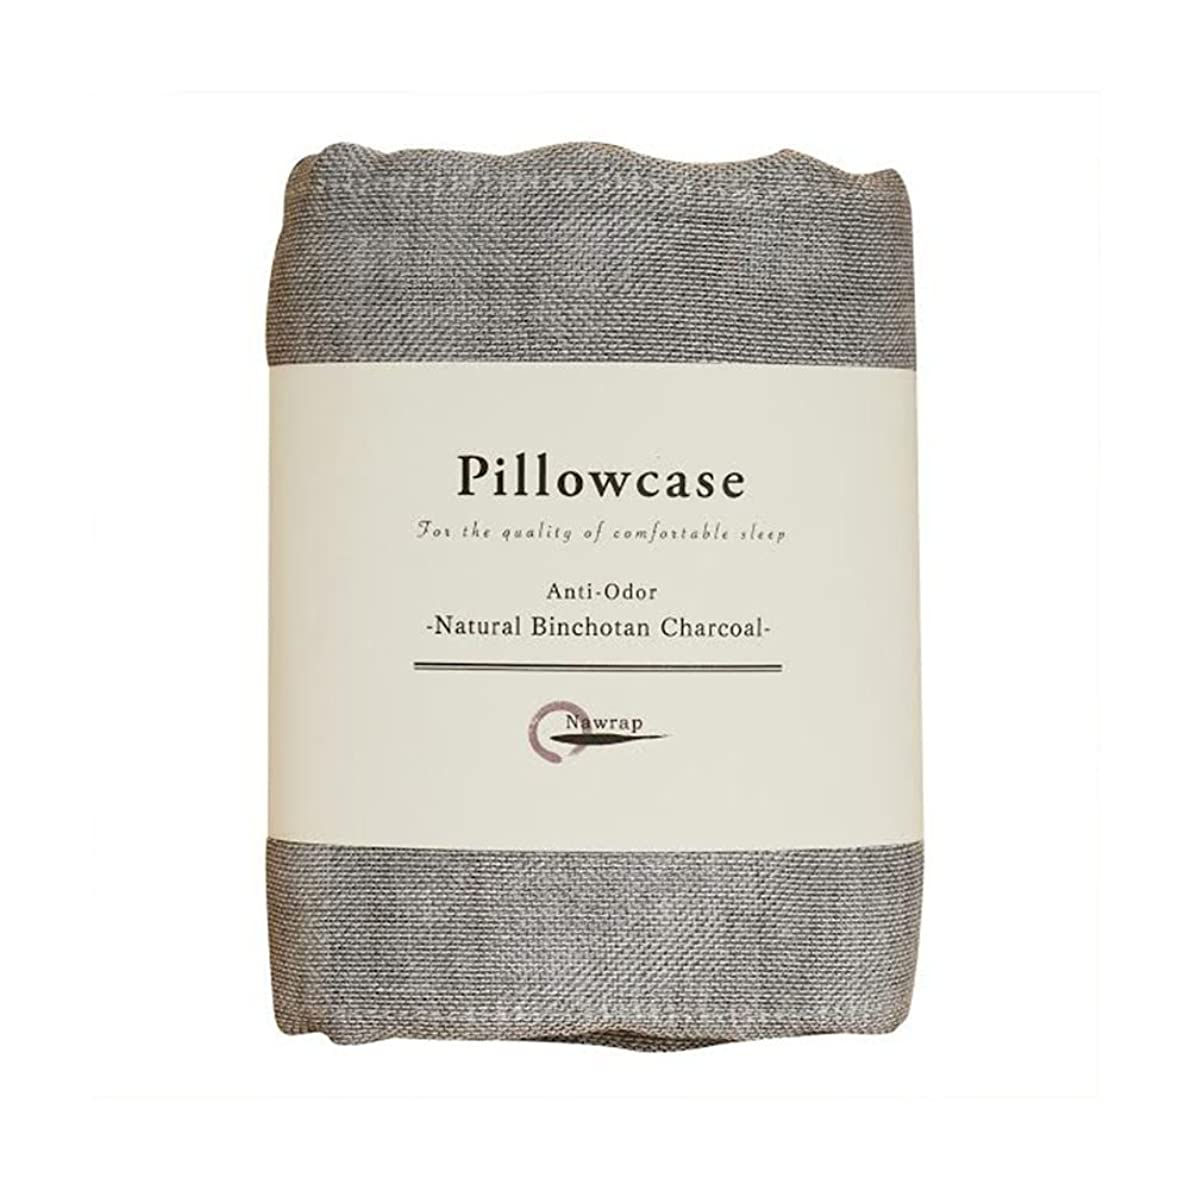 IPPINKA Nawrap Binchotan Charcoal Pillowcase, Naturally Anti-Odor